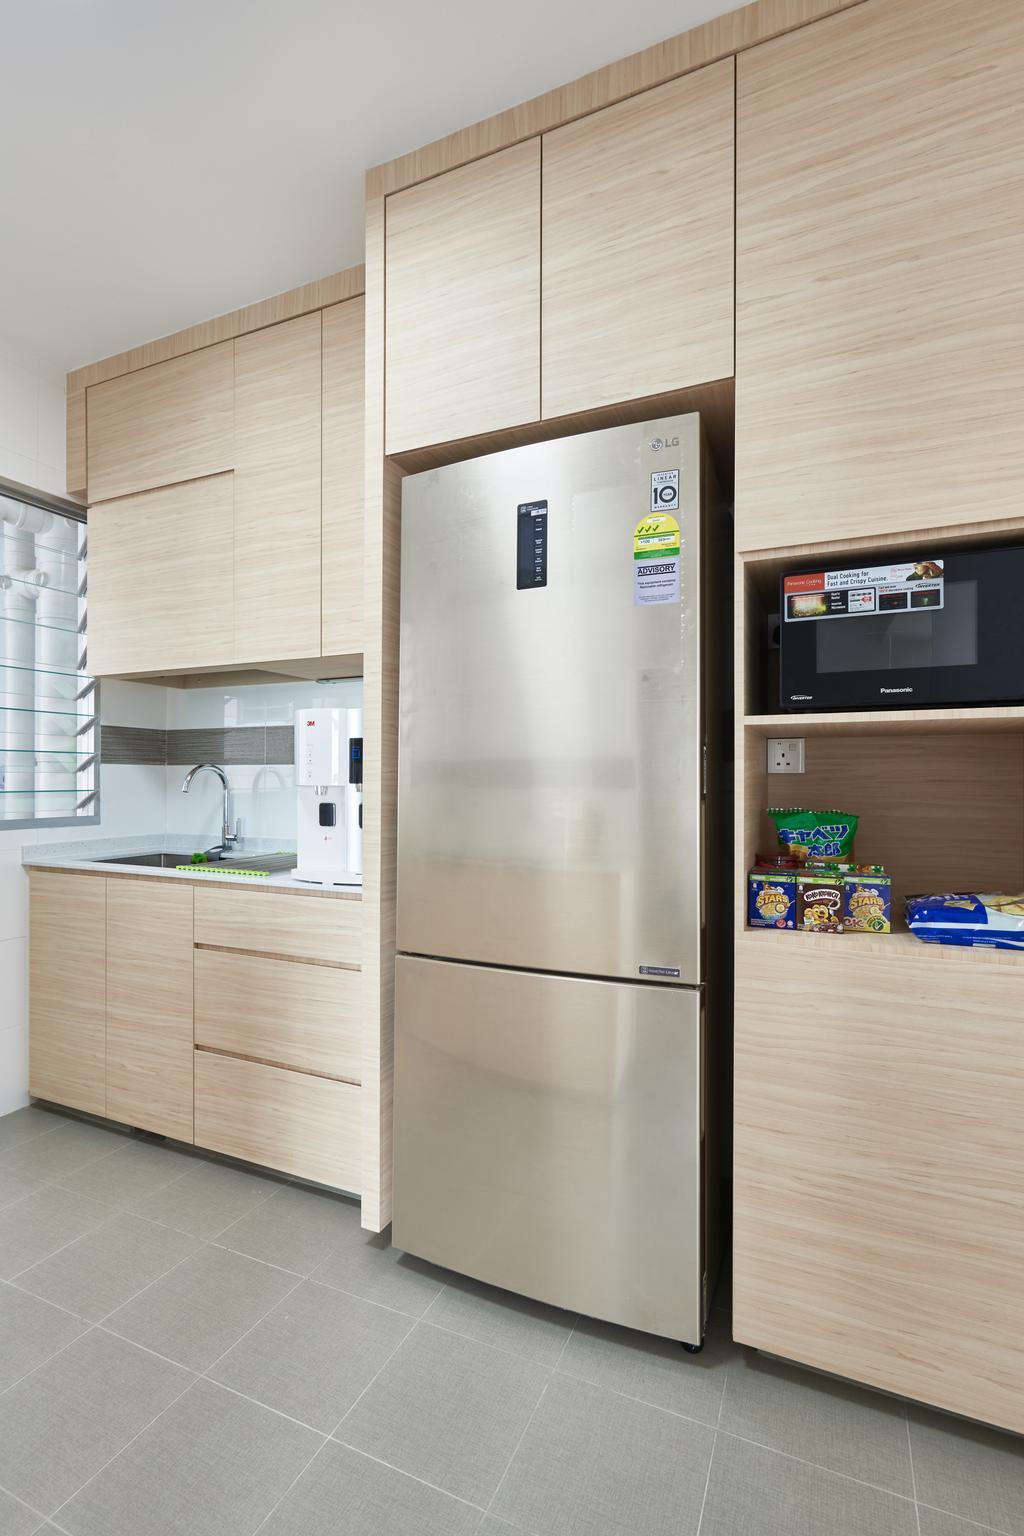 Scandinavian, HDB, Kitchen, Yung Kuang Road, Interior Designer, Inclover Design, Appliance, Electrical Device, Fridge, Refrigerator